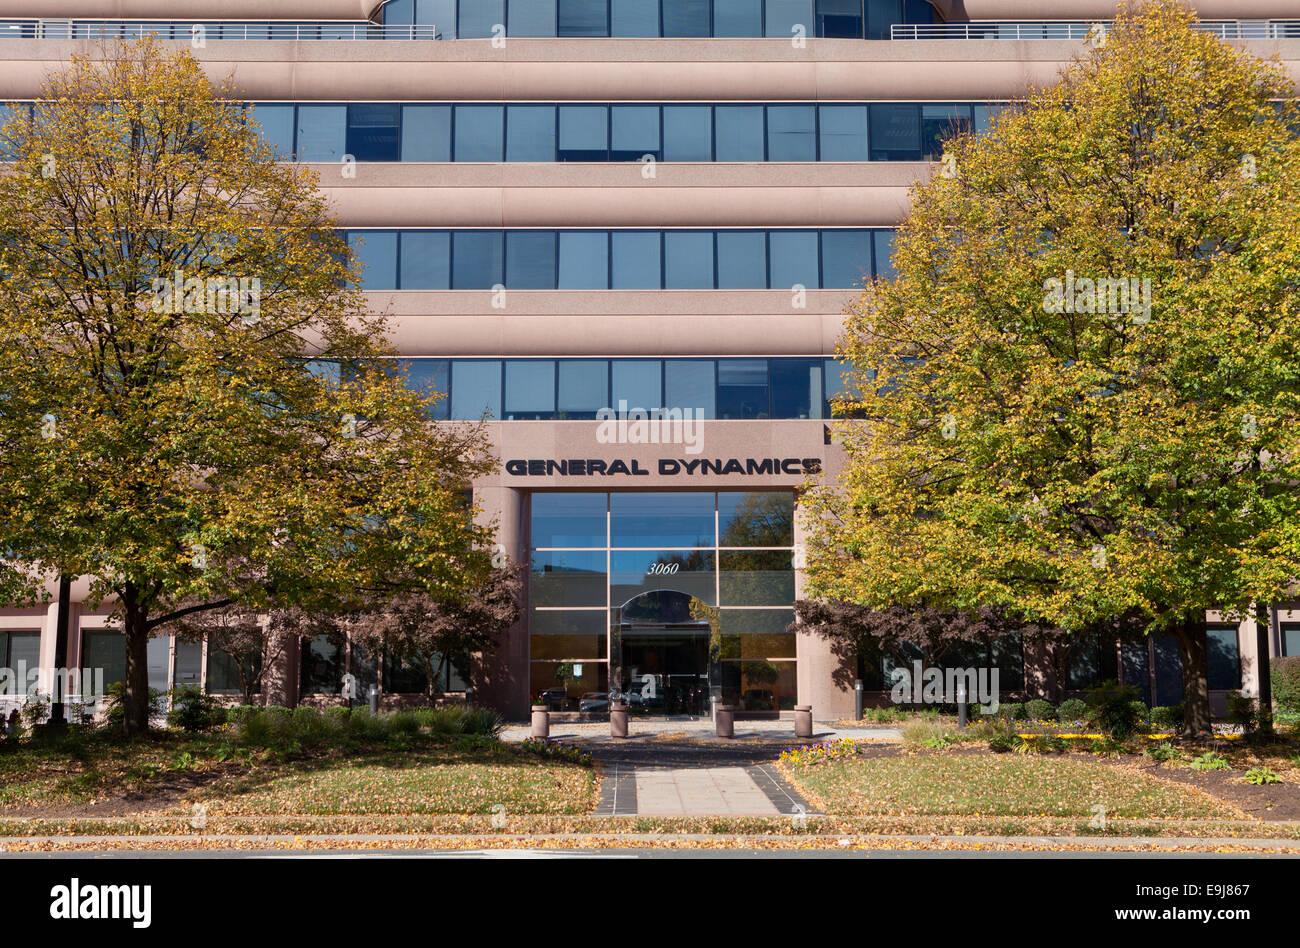 General Dynamics headquarters building - West Falls Church, Virginia USA - Stock Image